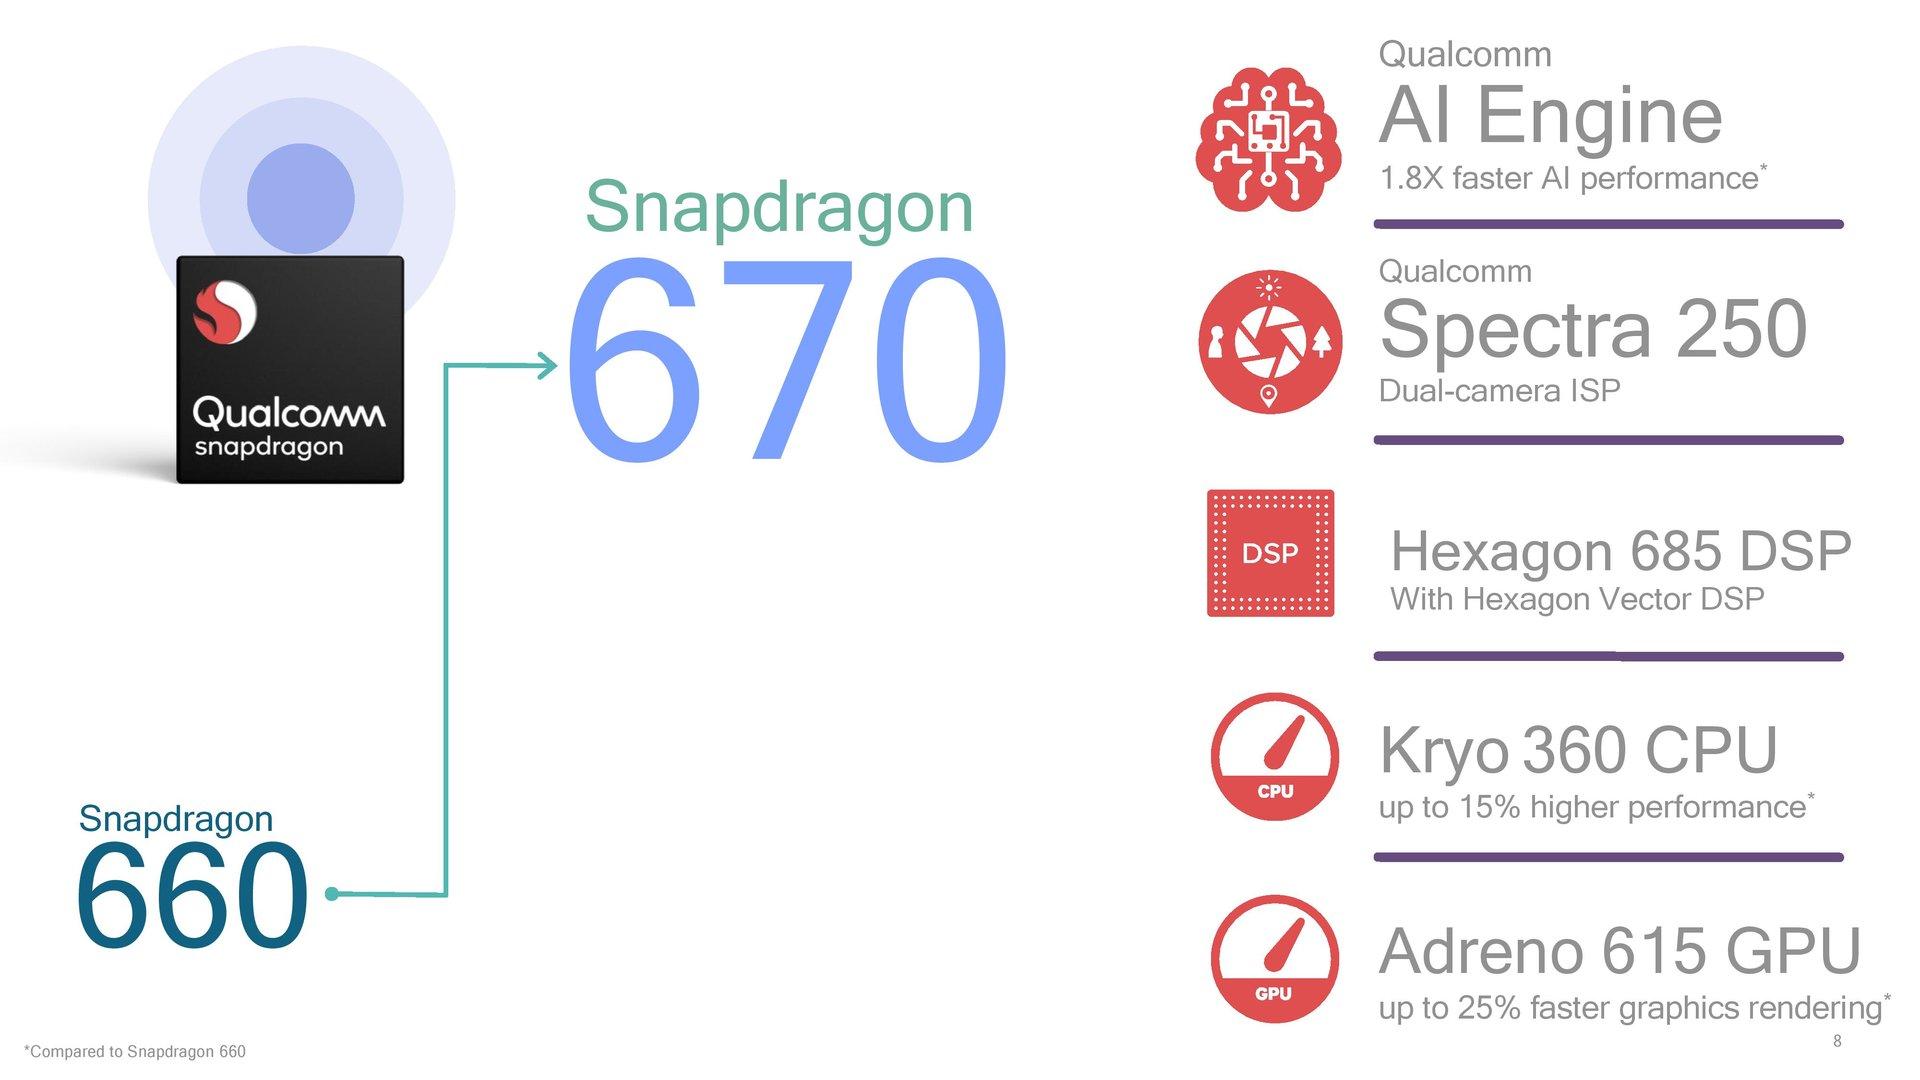 Eckdaten des Snapdragon 670